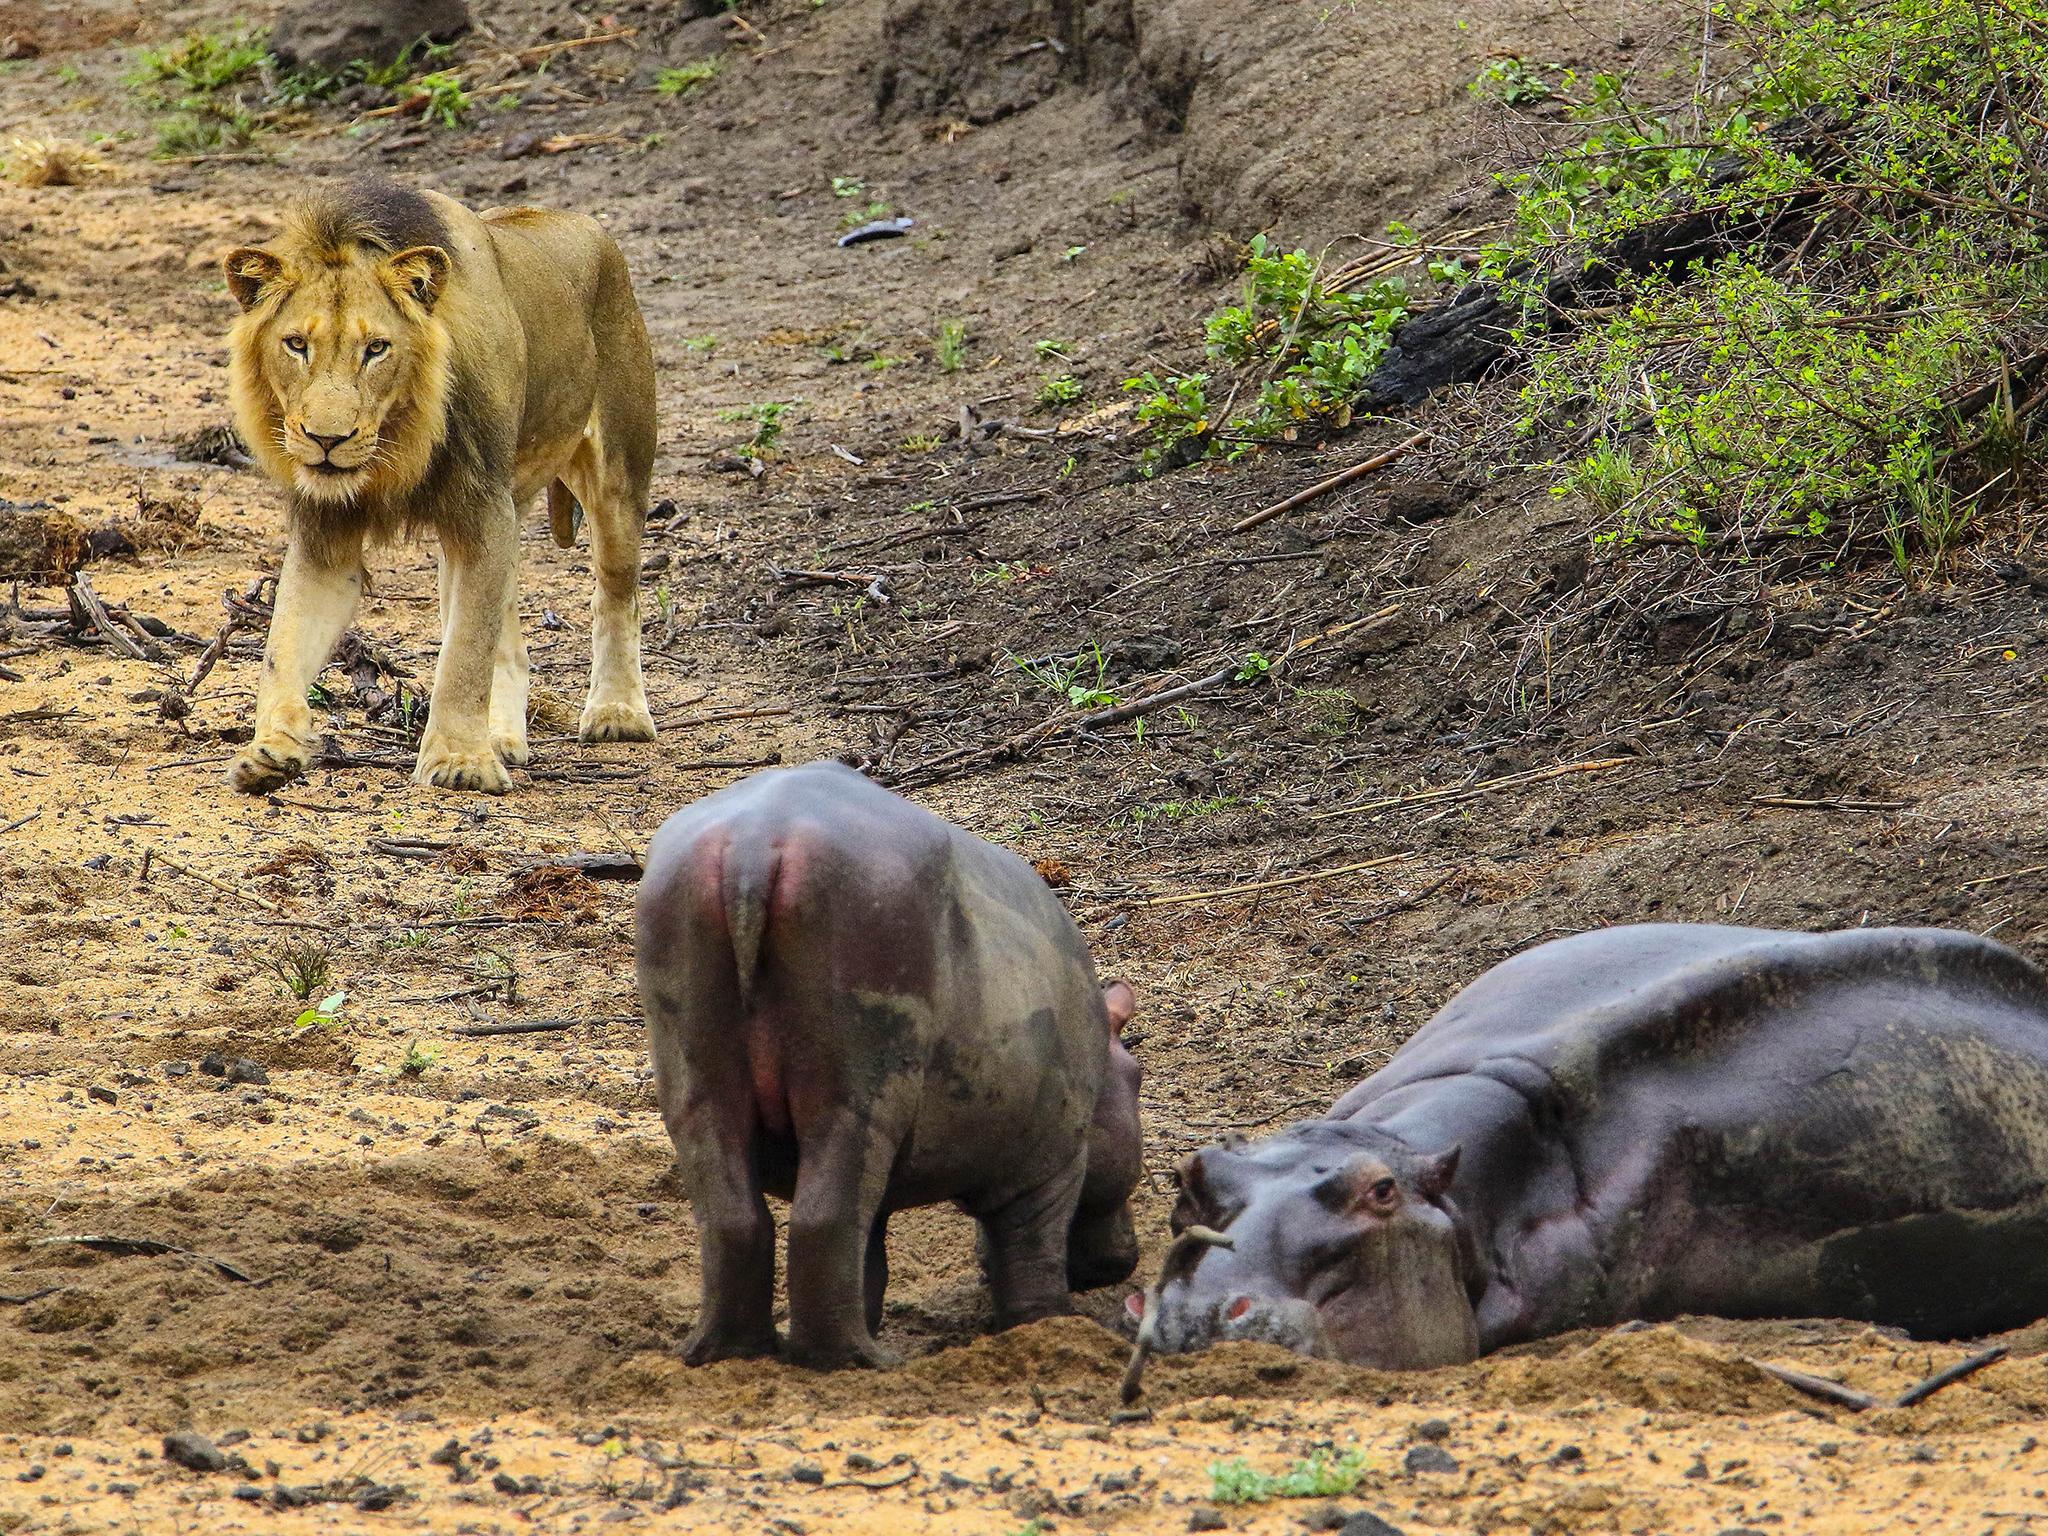 Czech man mauled to death by lion he kept in back garden